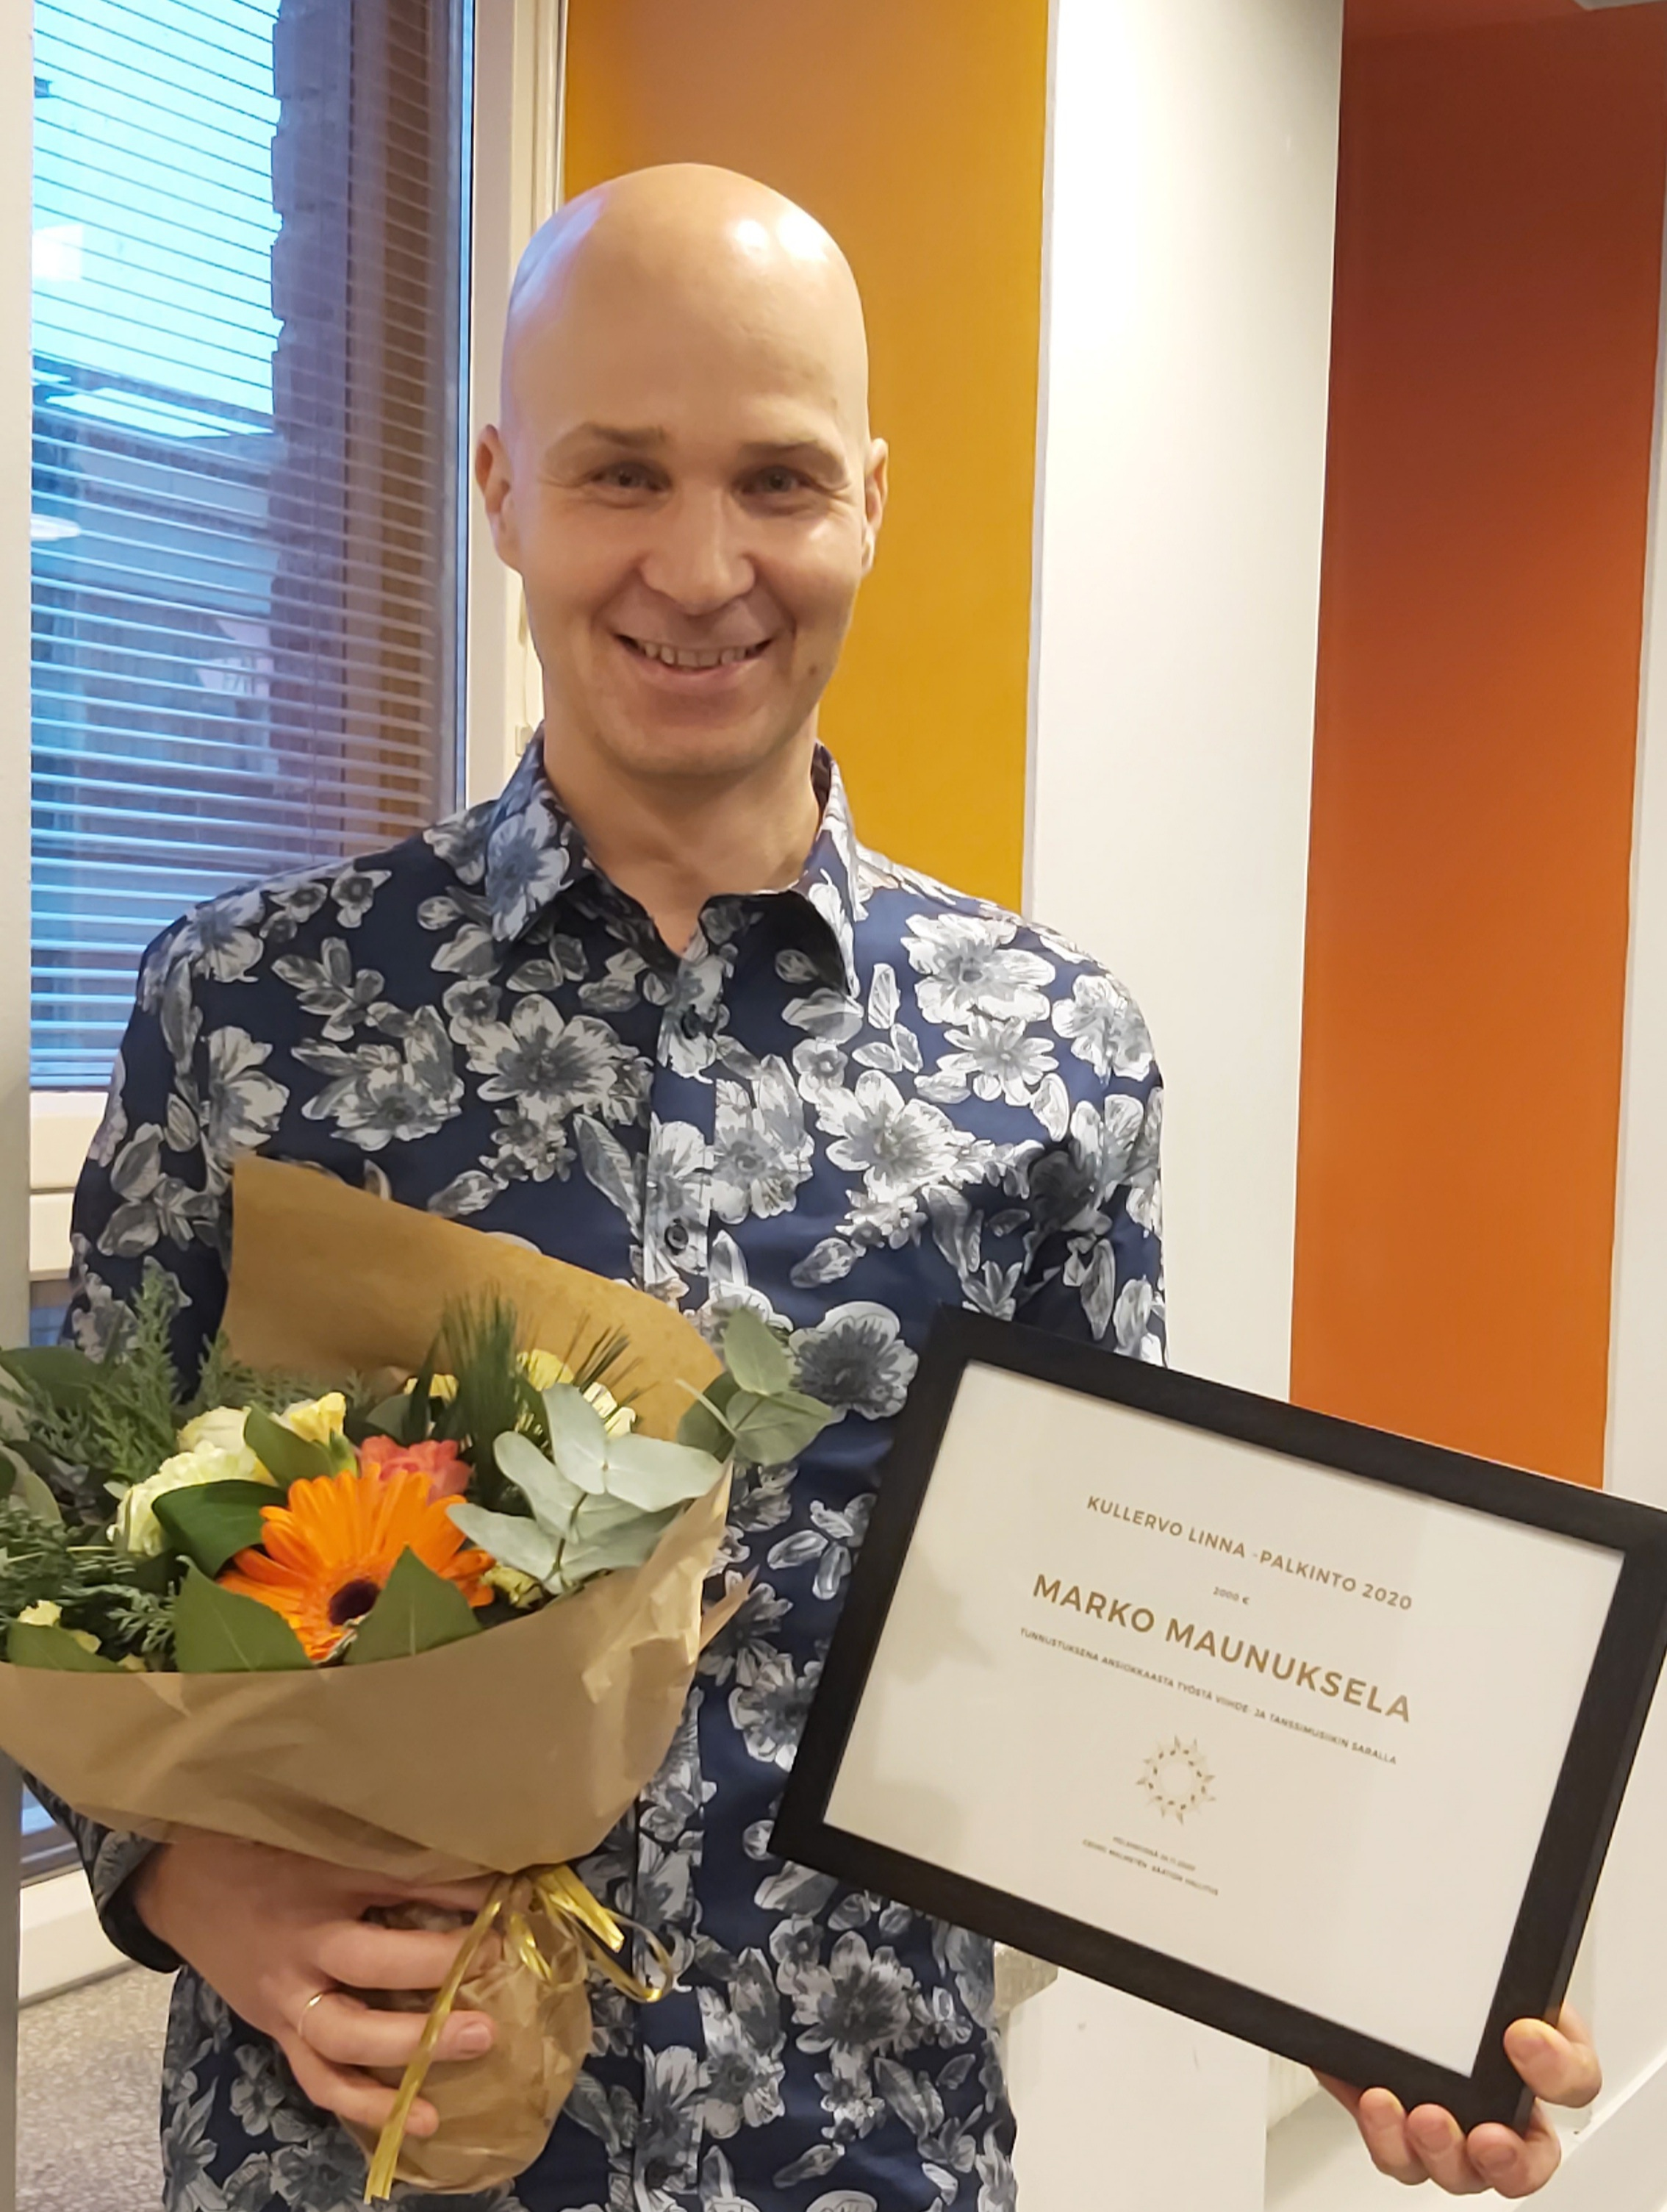 Marko Maunukselalle Kullervo Linna – palkinto